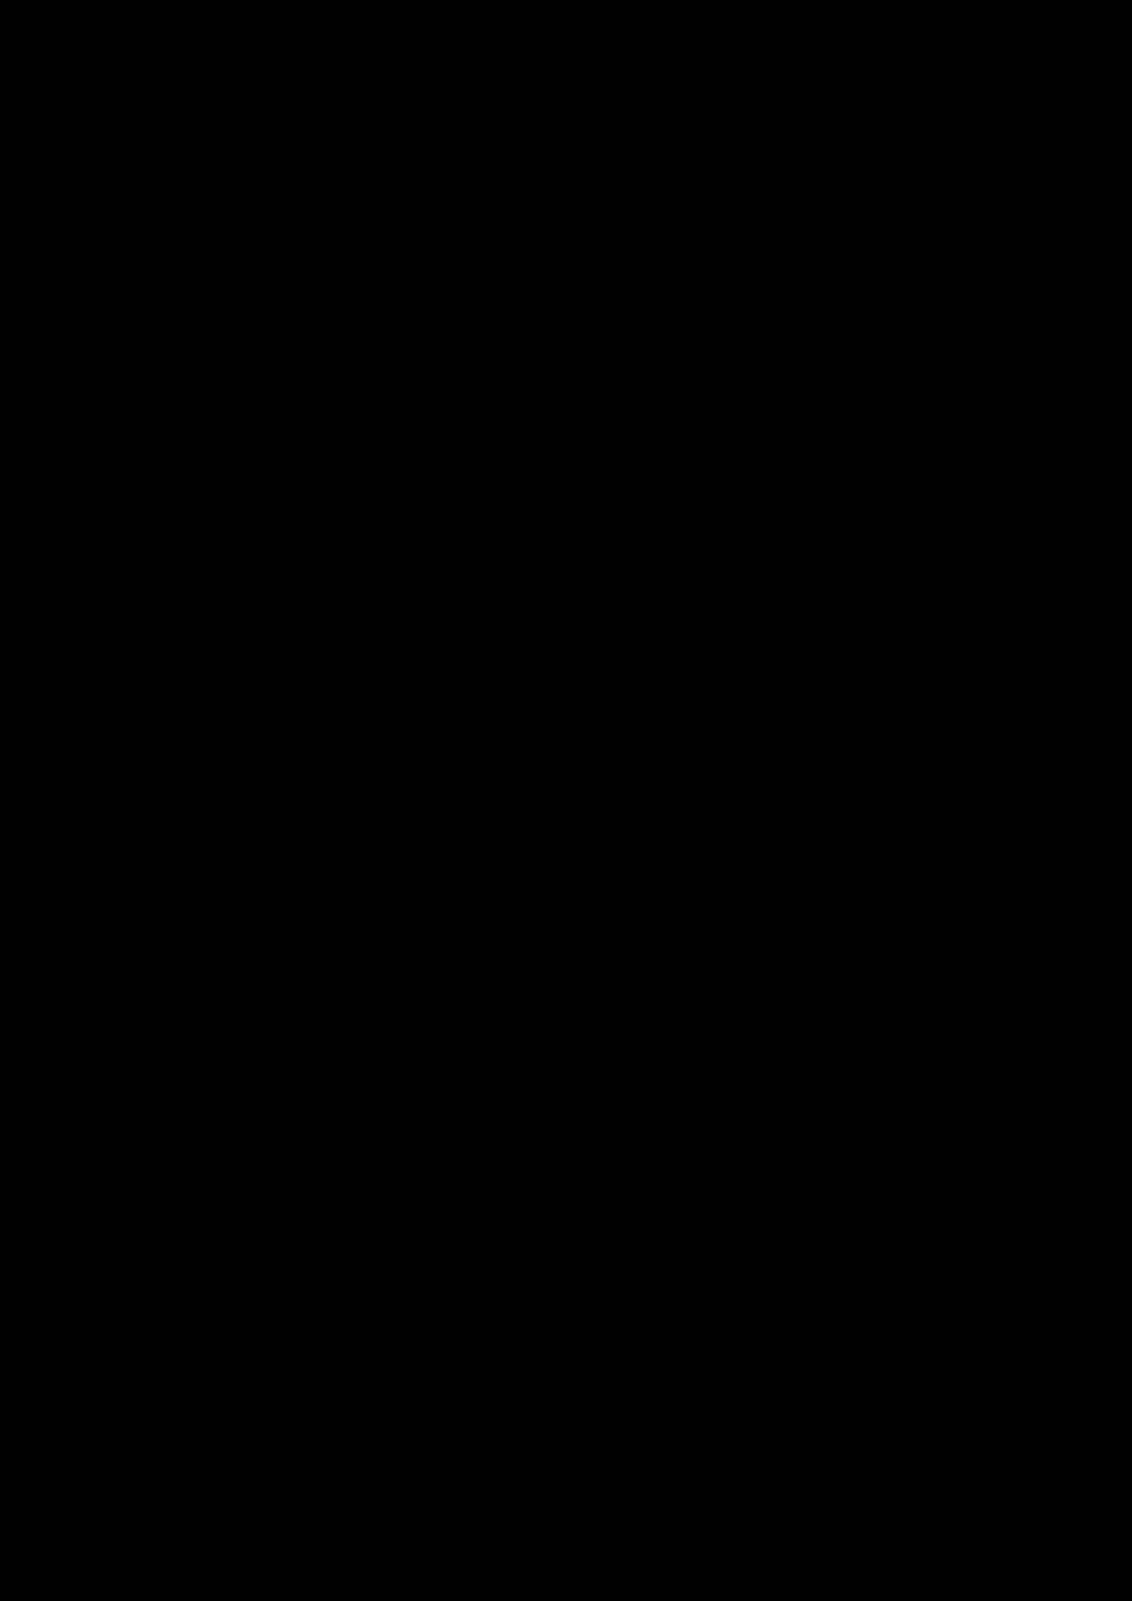 Korolevstvo slez slide, Image 12